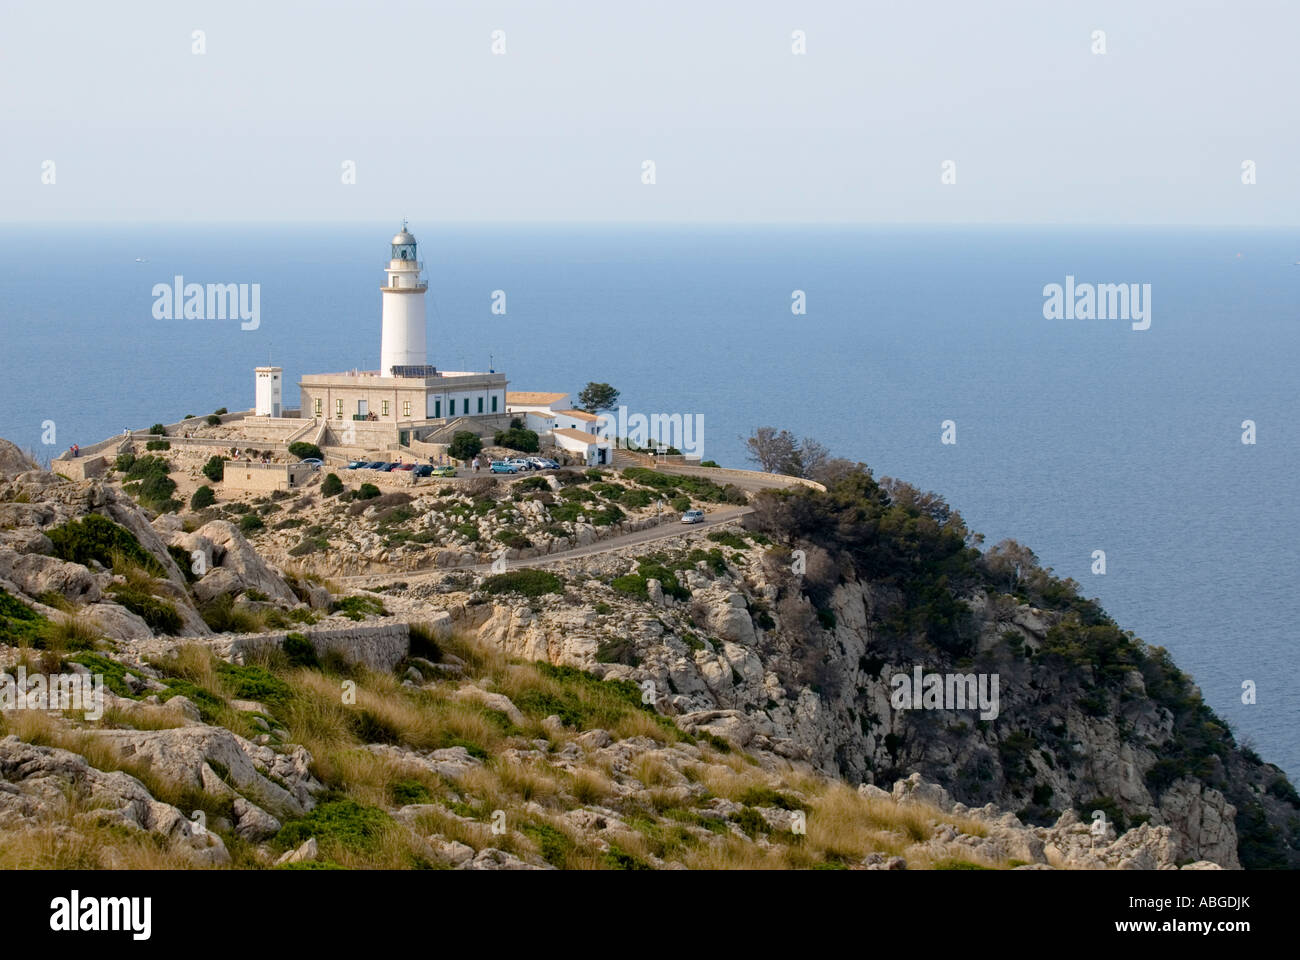 Lighthouse at ap Formentor, Majorca, Spain - Stock Image